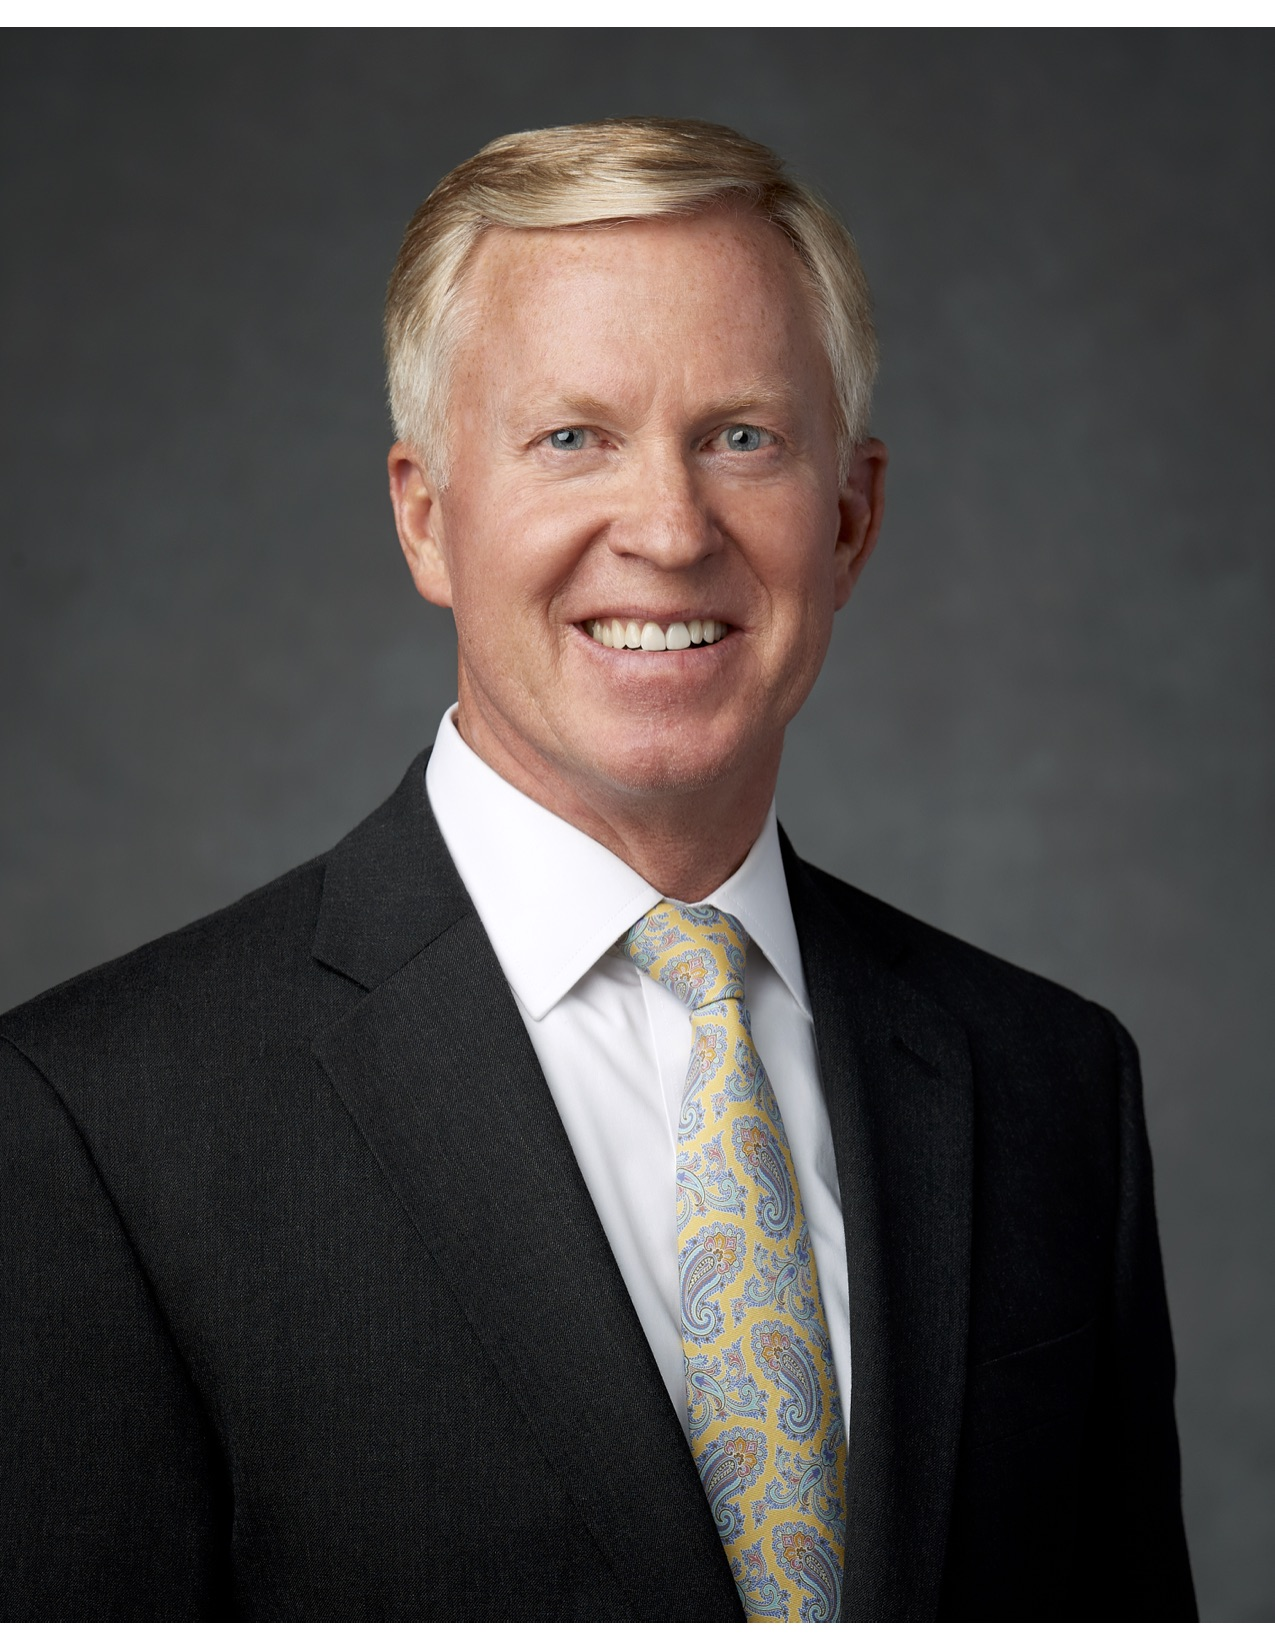 Michael T. Nelson